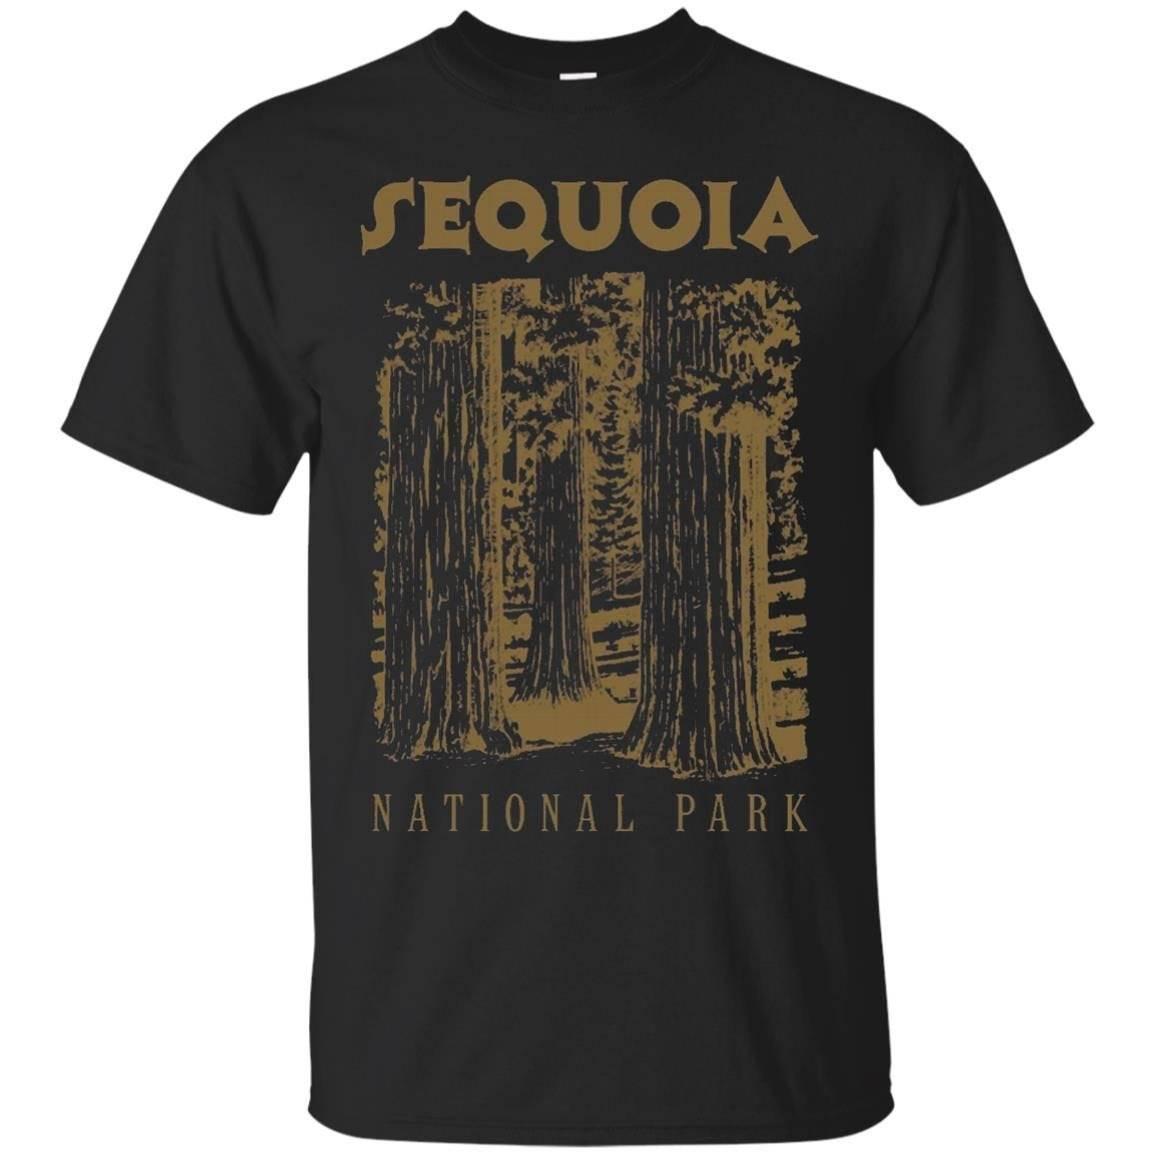 Sequoia National Park Tshirt I Love Hiking Wanderlust Tee – T-Shirt